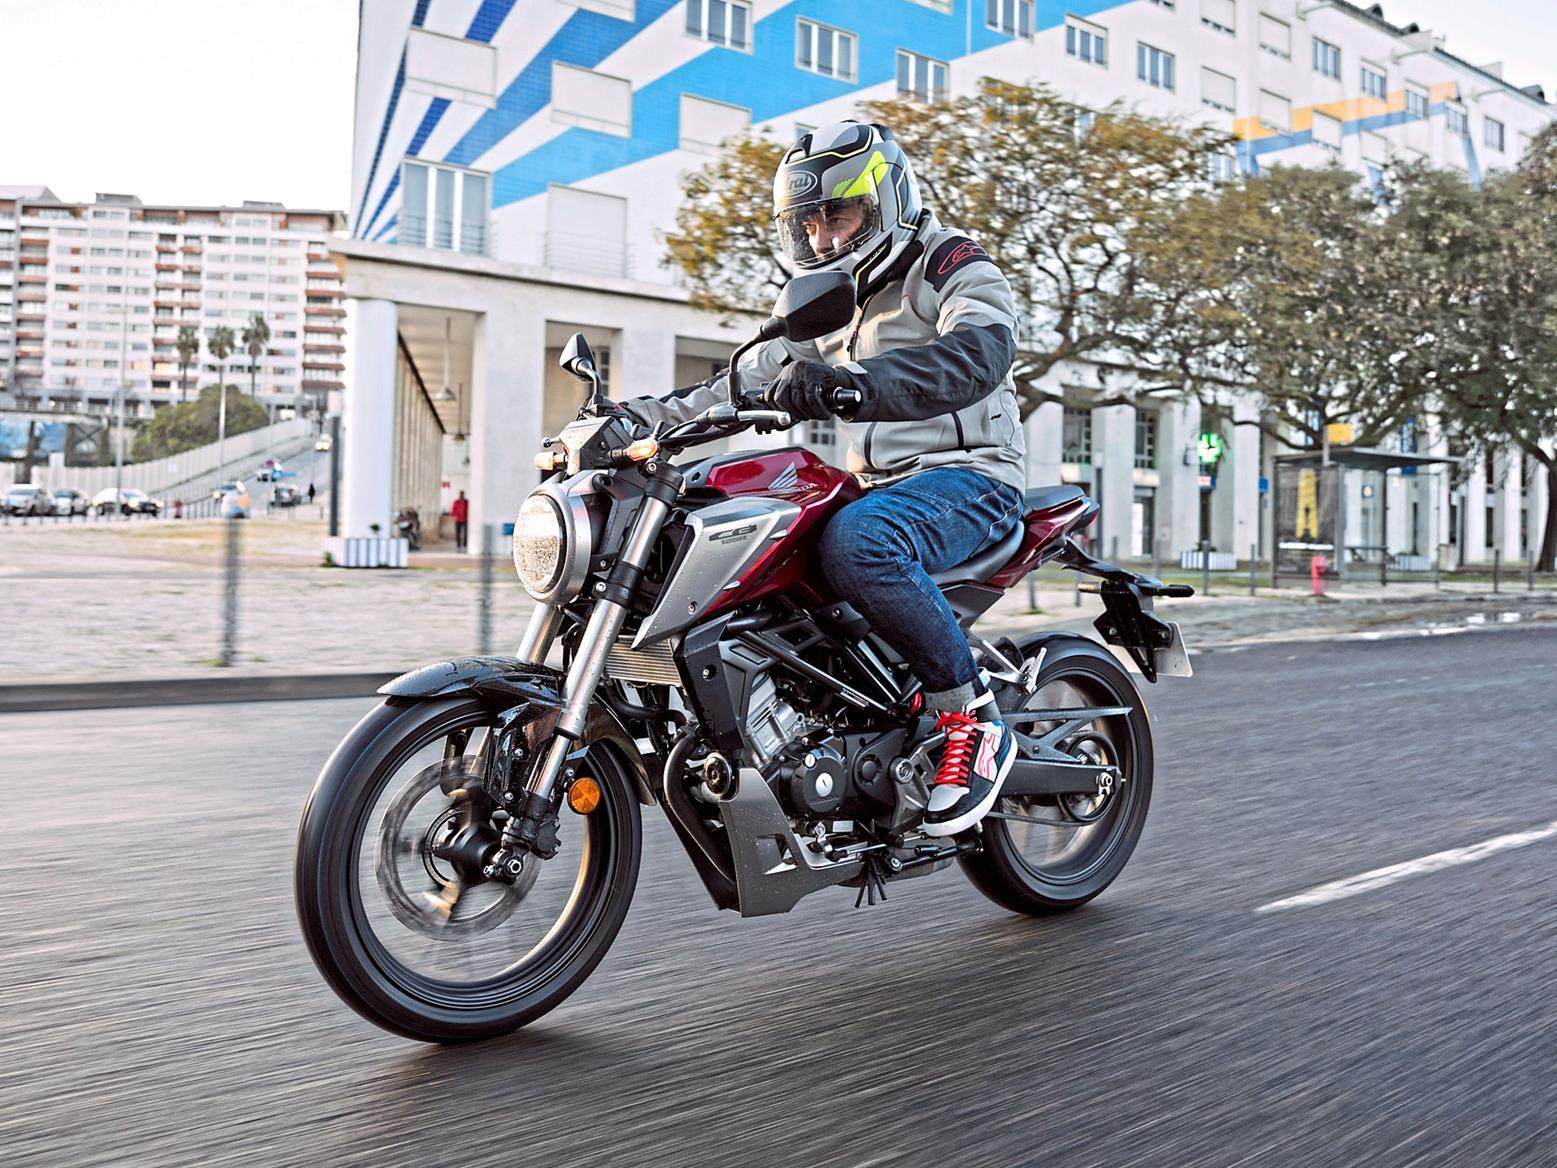 Best 125cc motorbikes of 2019